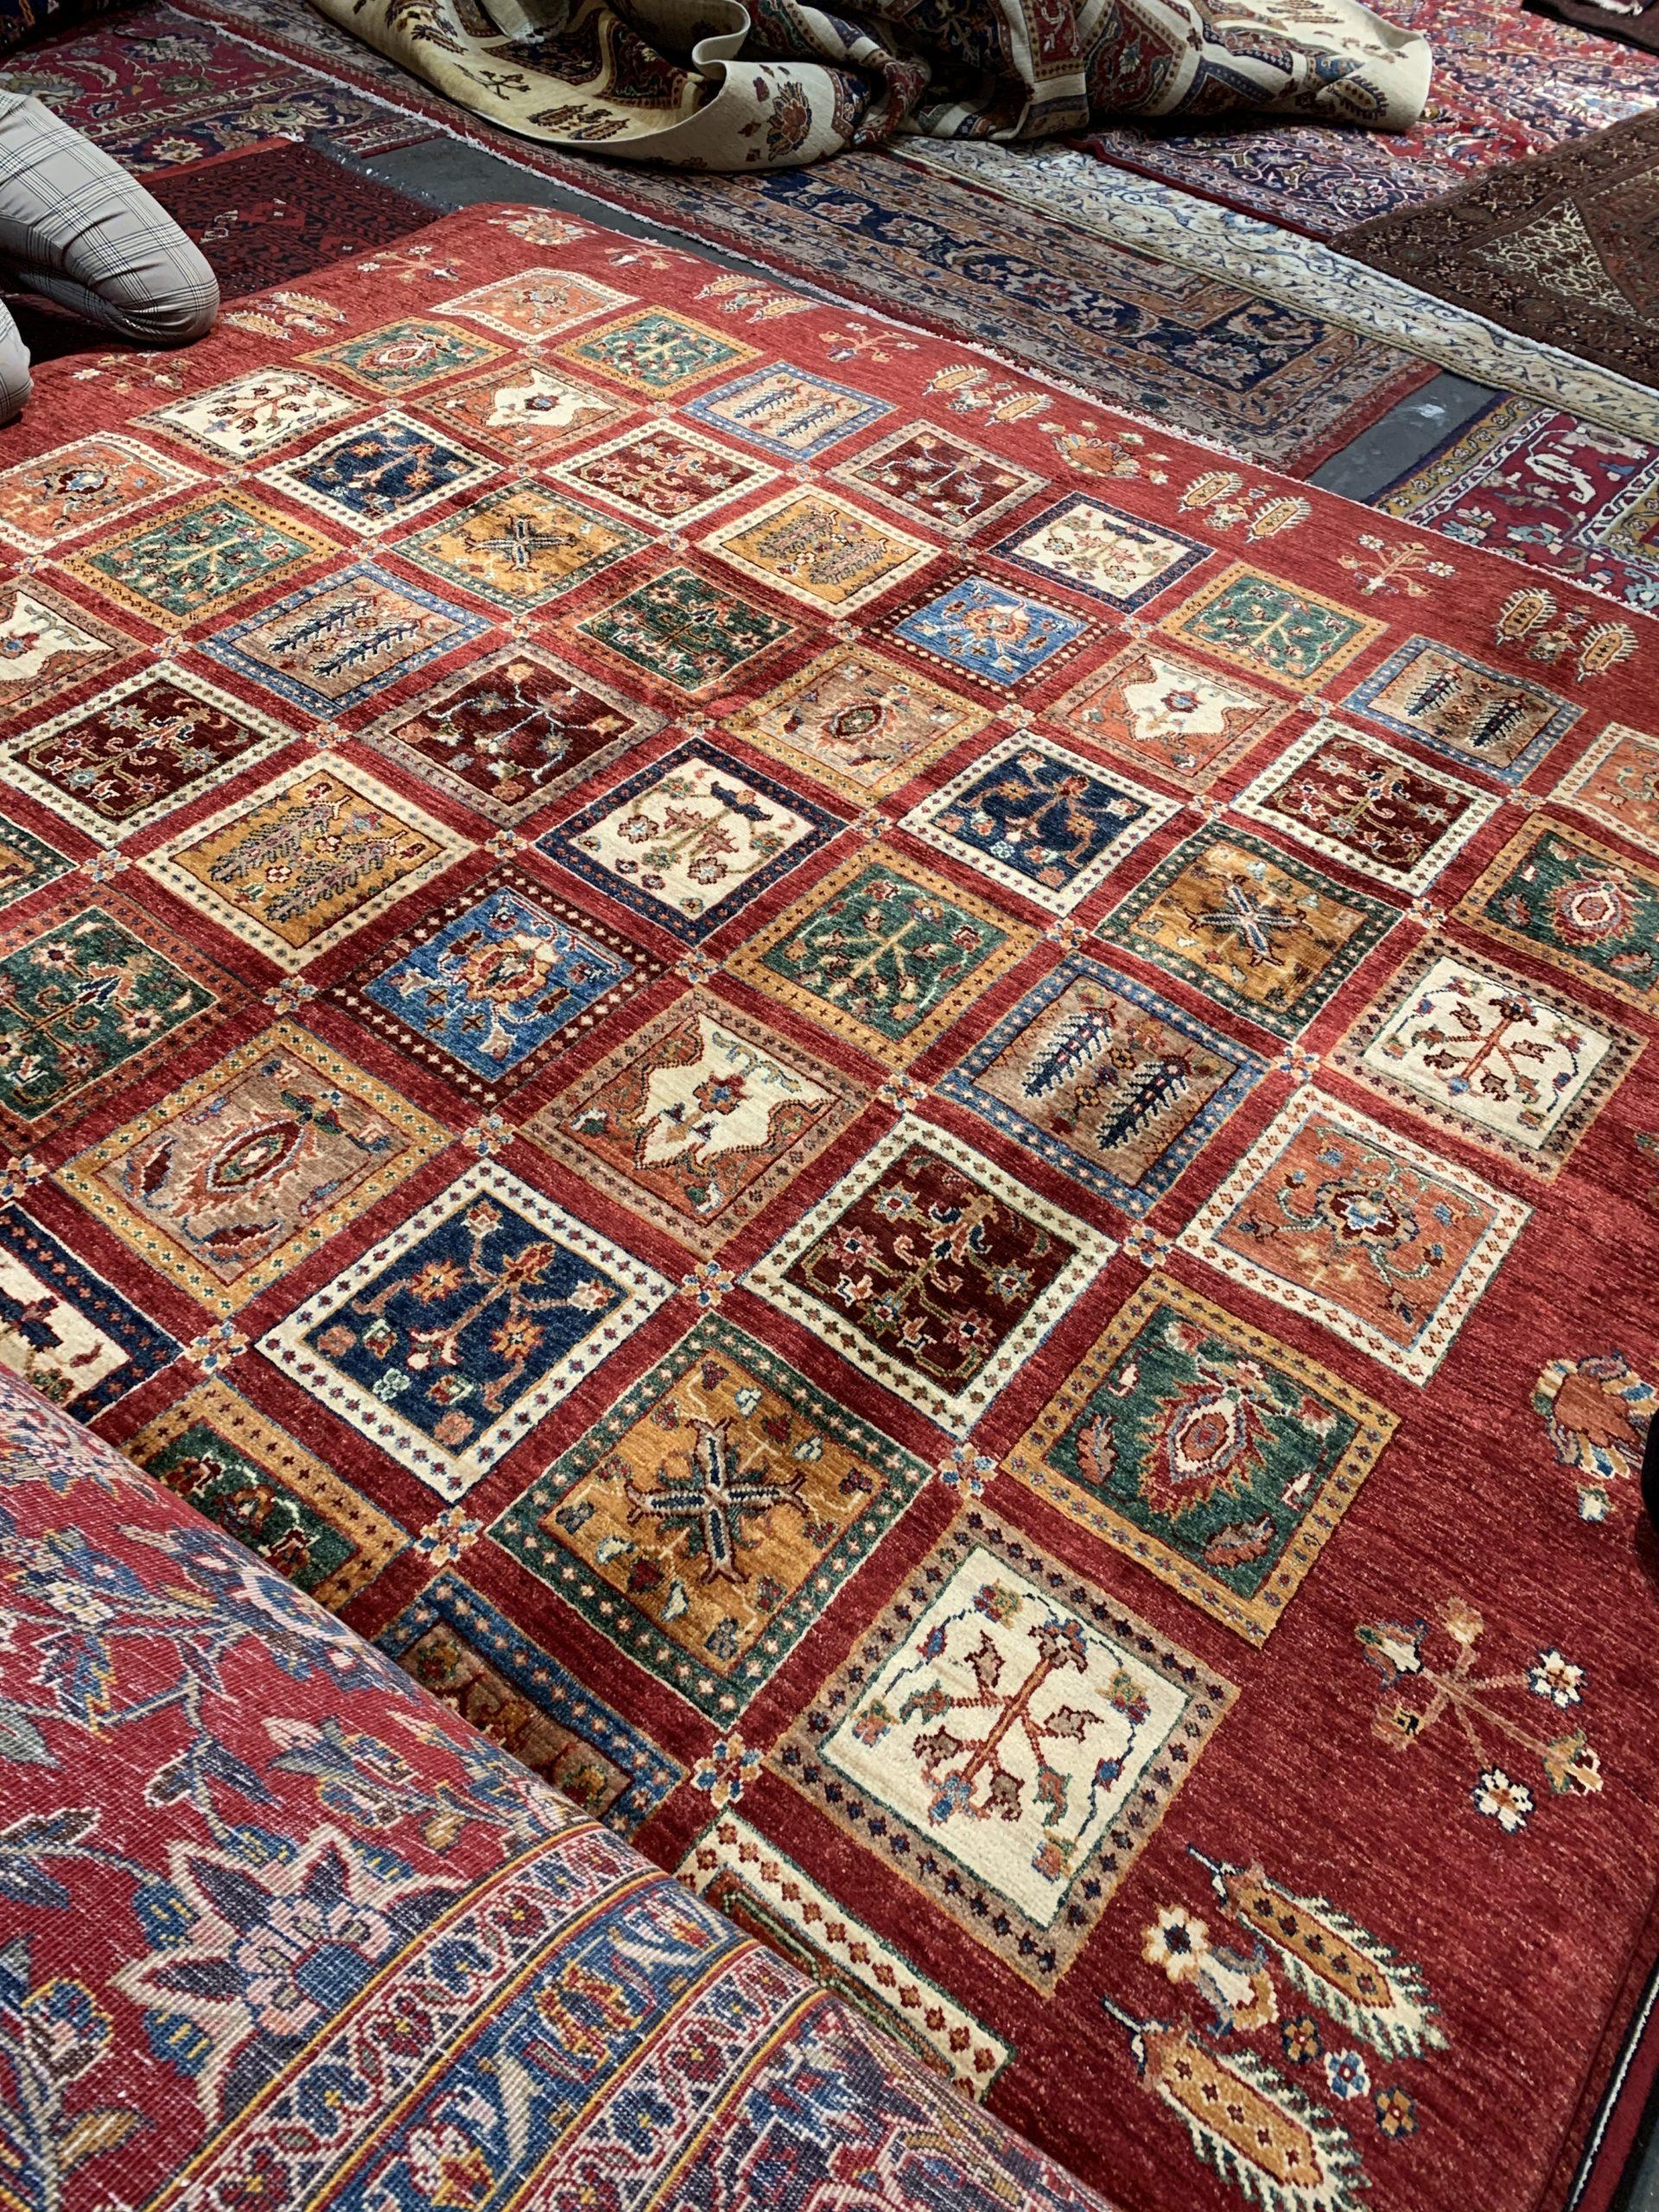 Visst är mattan vacker?